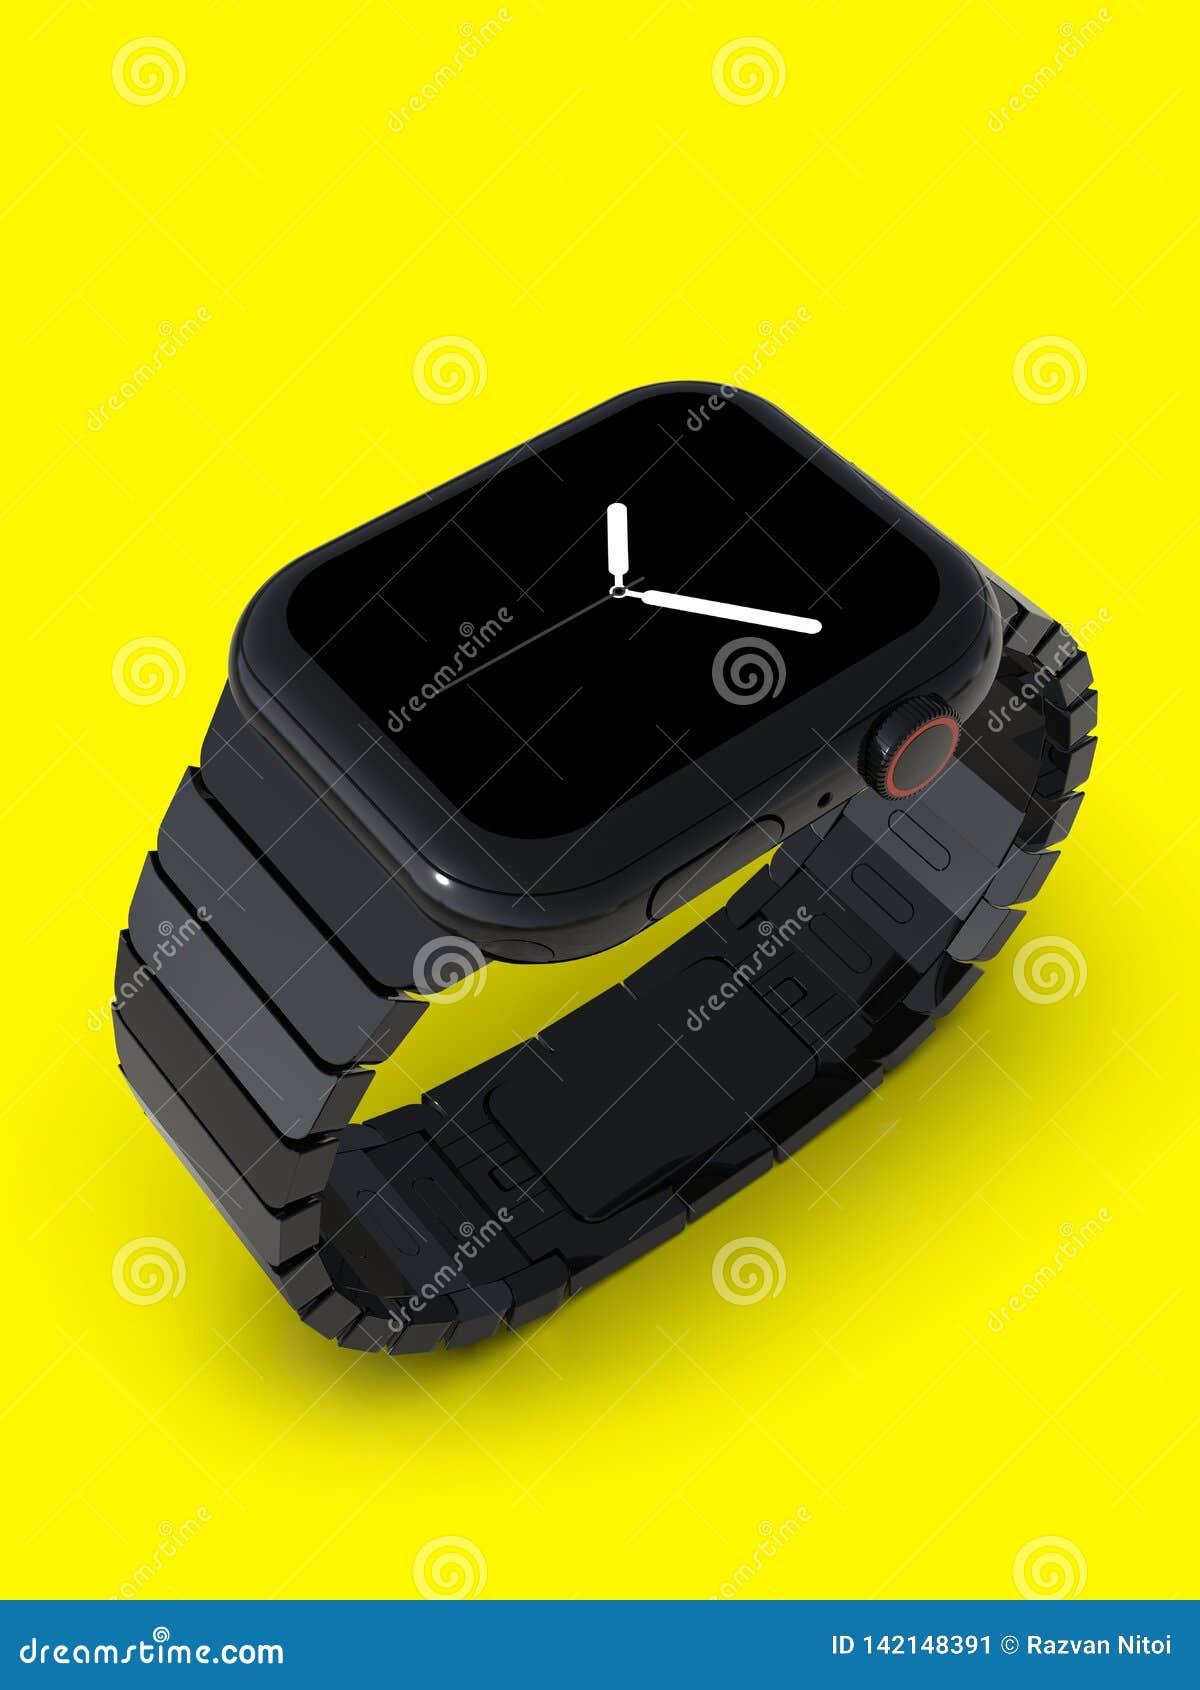 Apple Watch 4, 44mm, black steel smartwatch, analog display